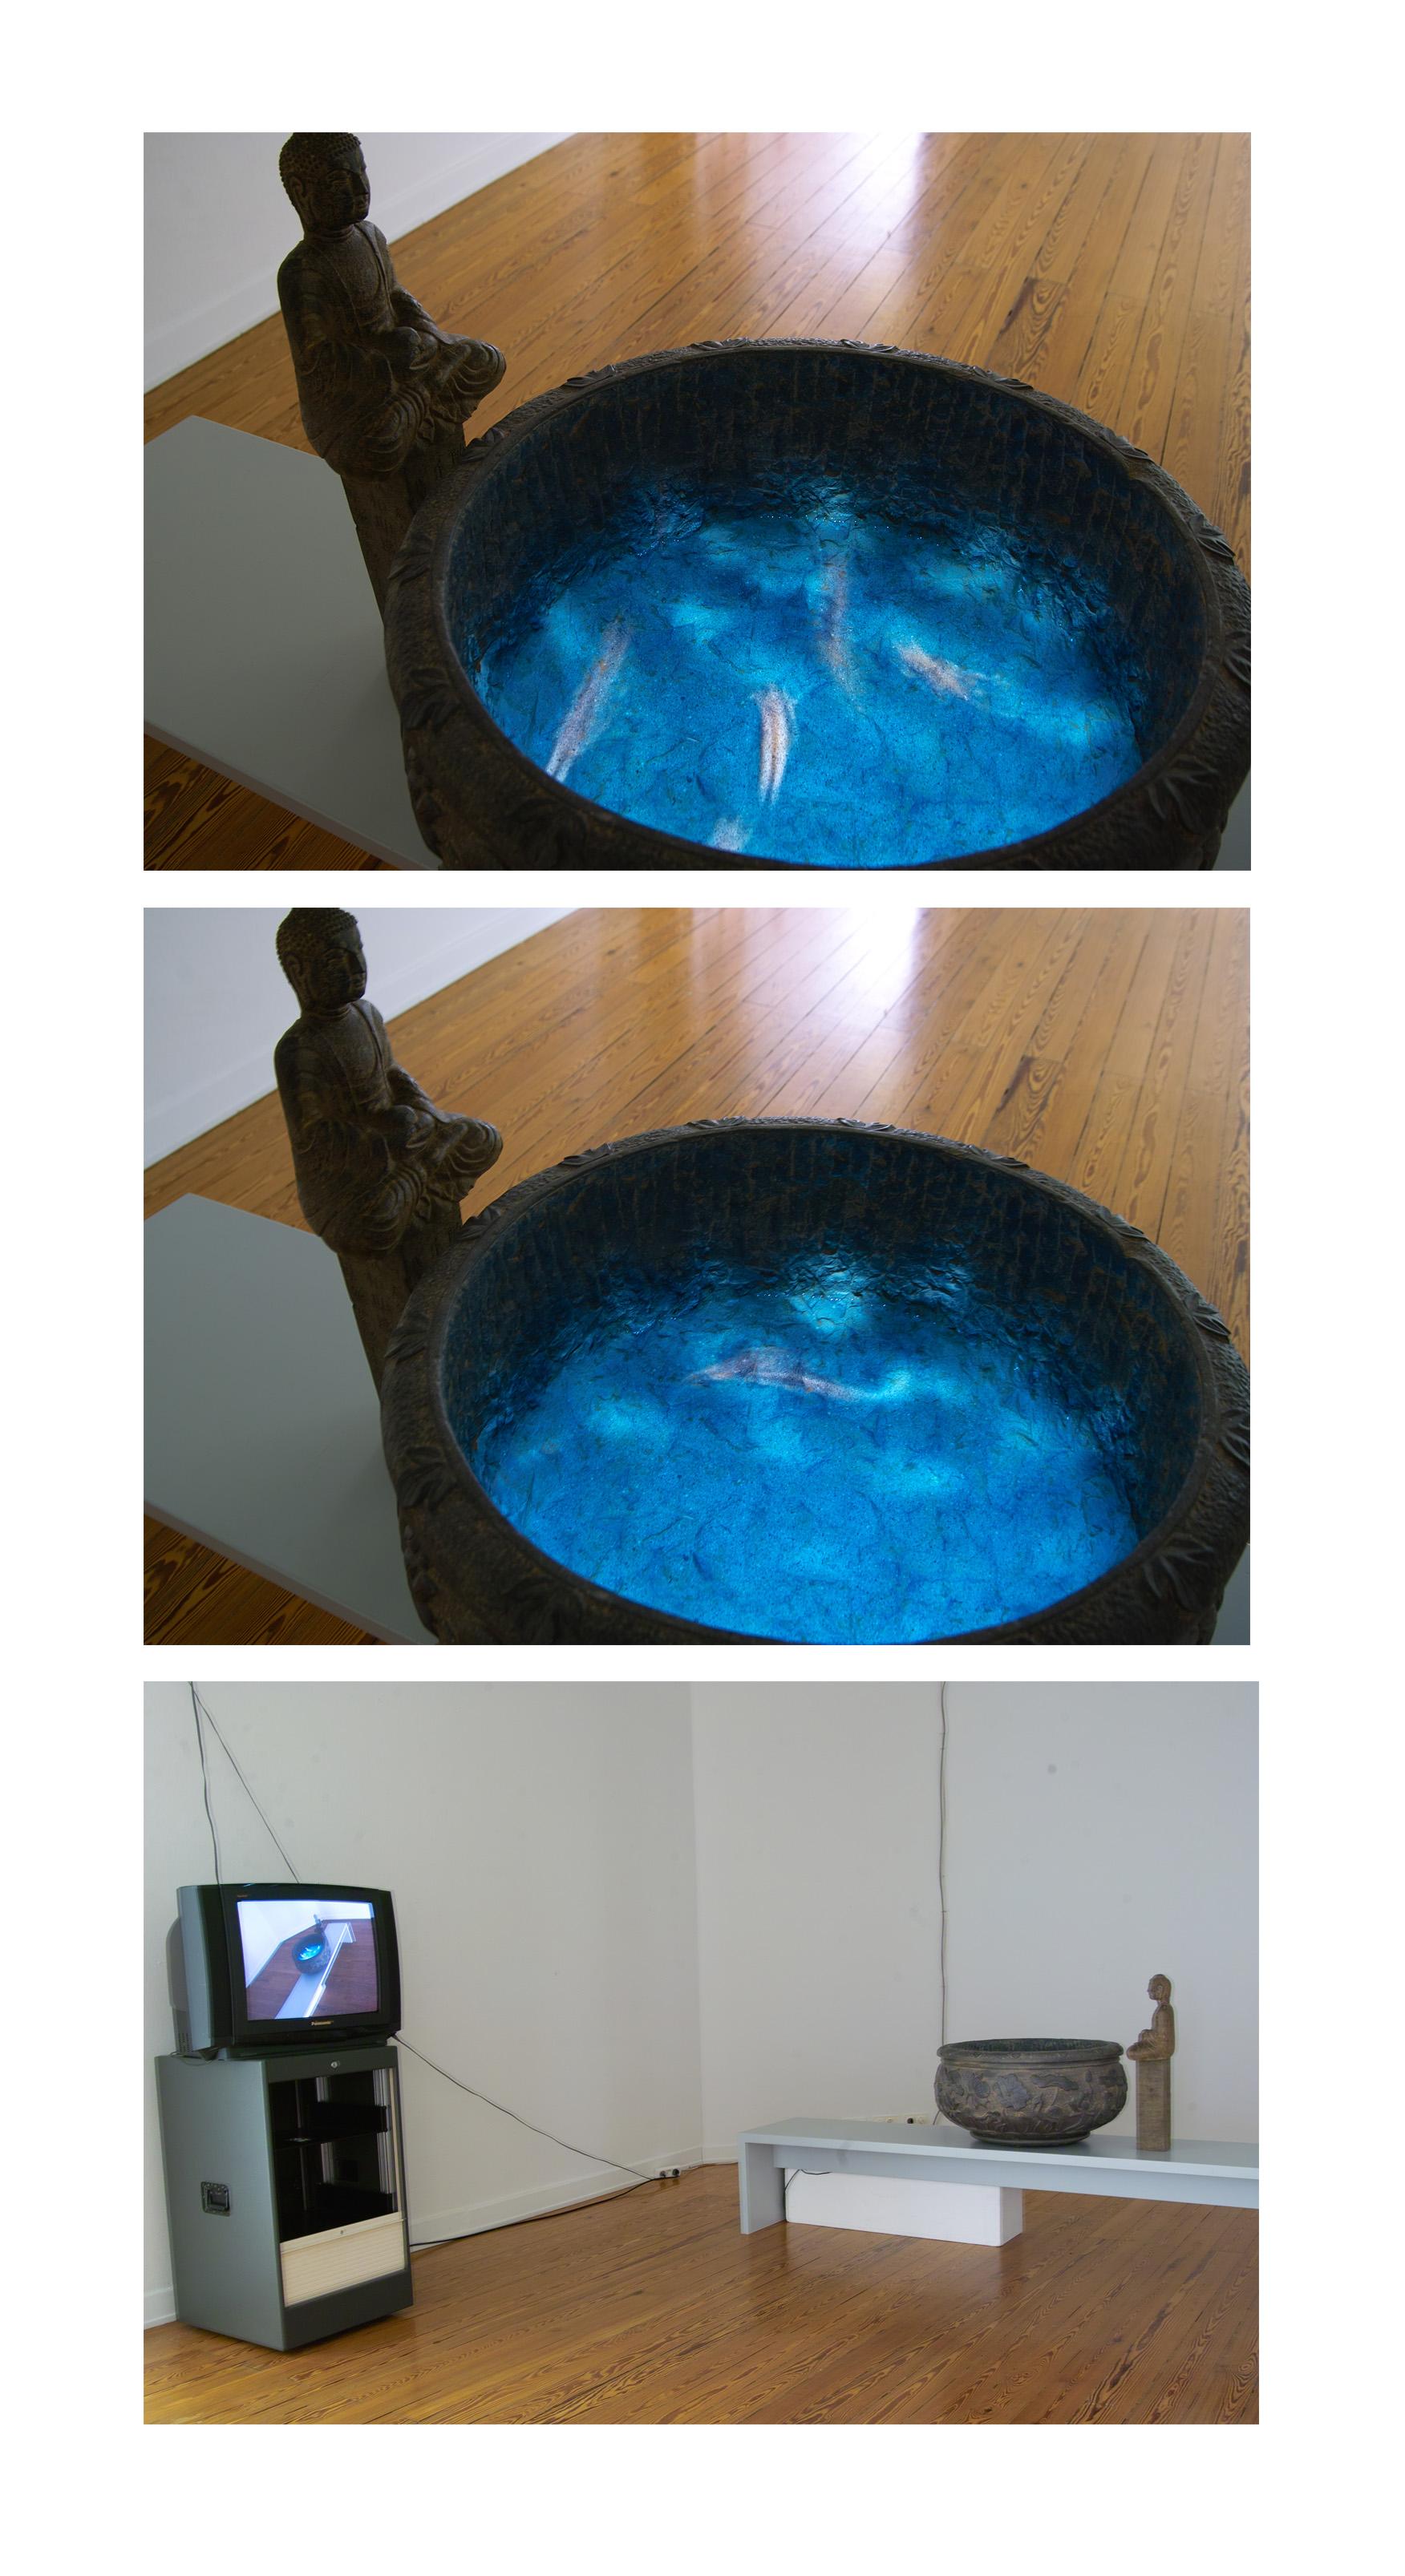 Zhou Jinhua 周金华, Wait and See 静观其变, 2009, Video Installation 影像装置